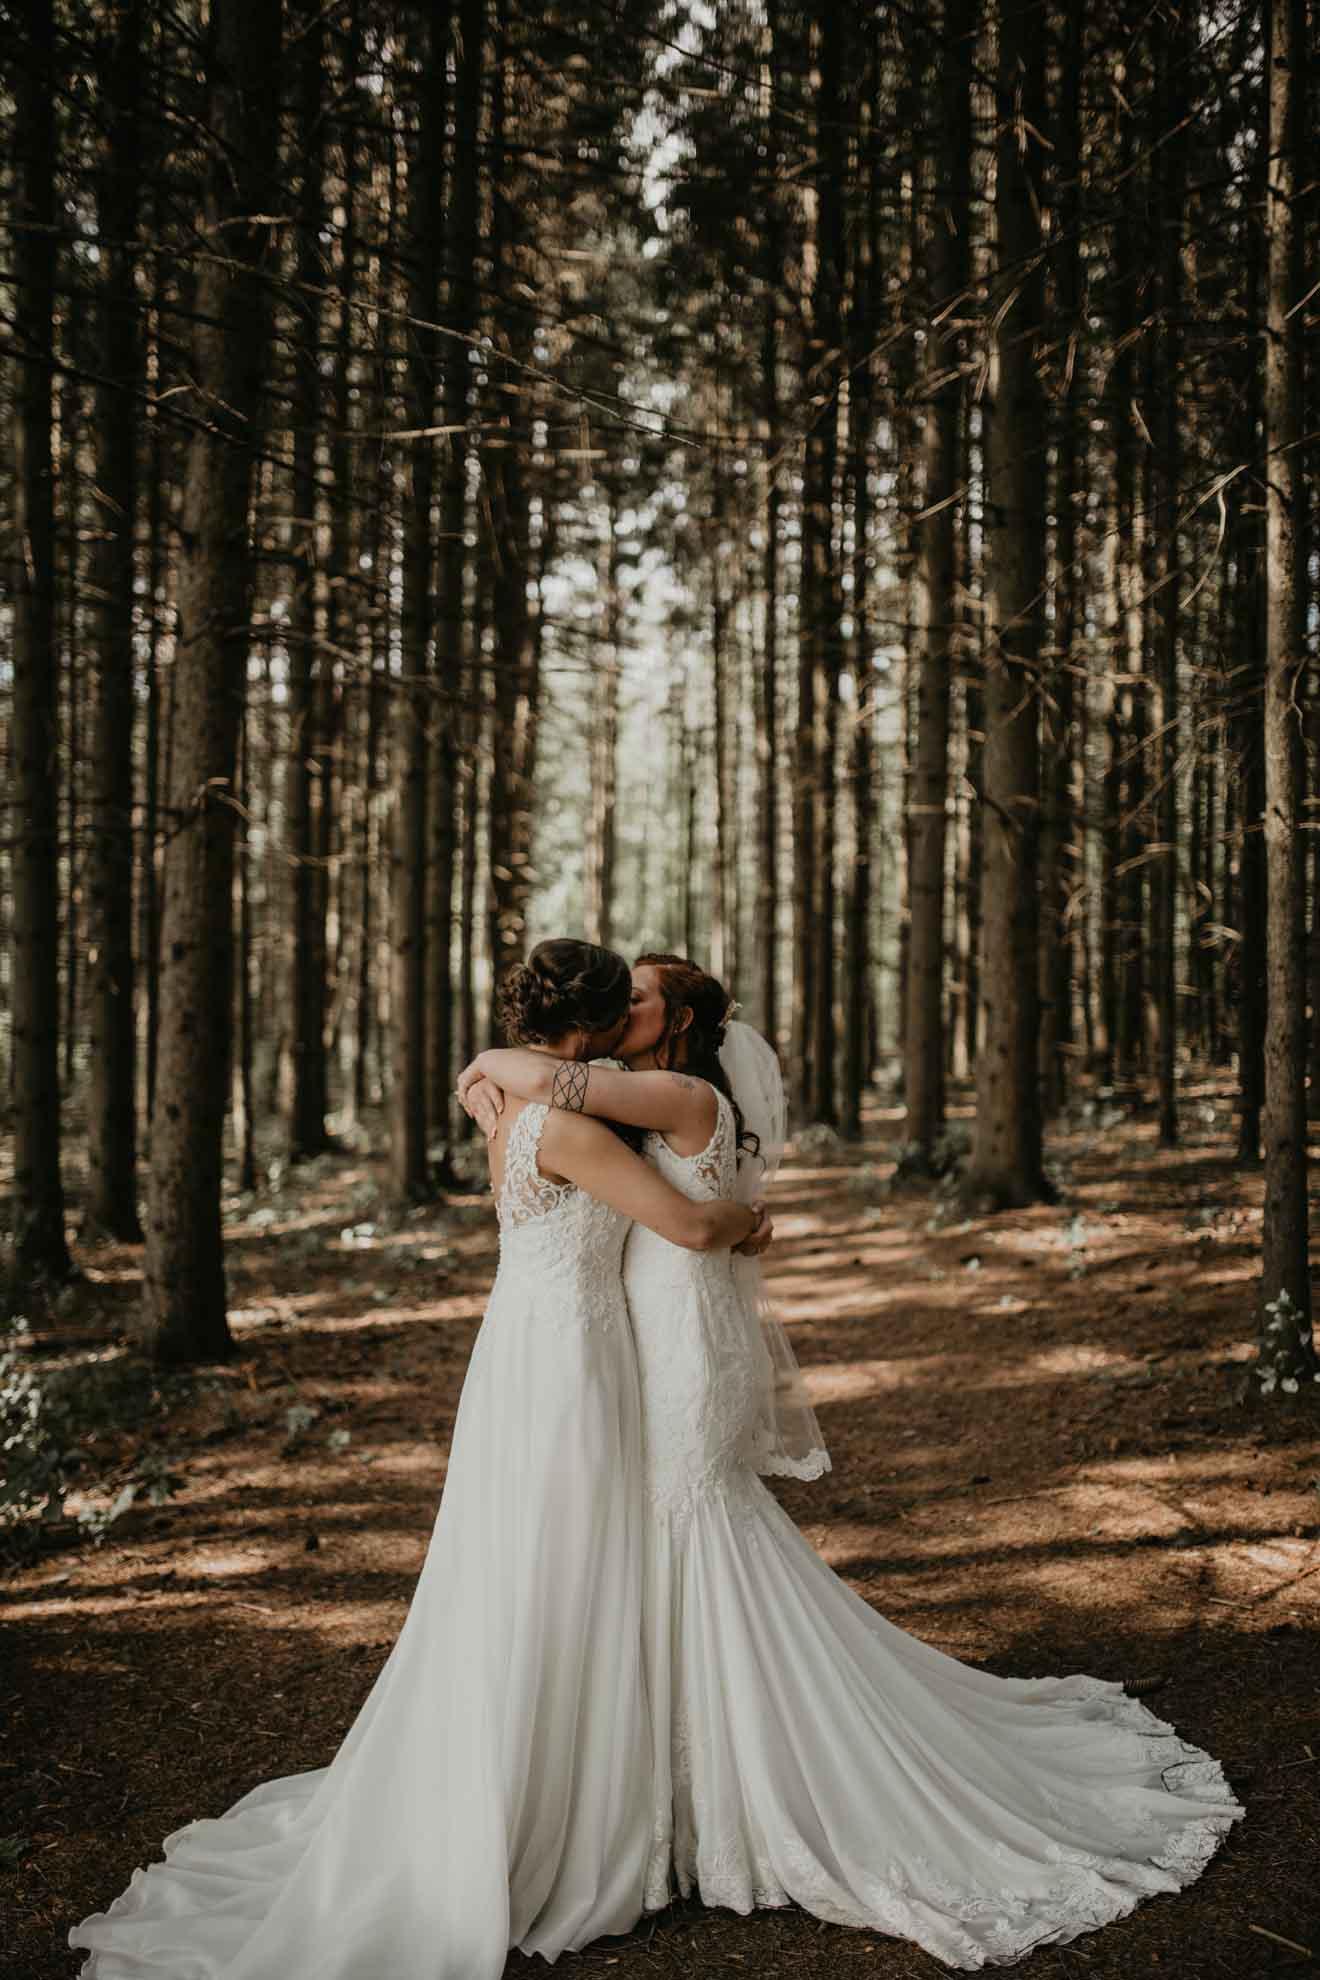 Sandra Lynn Photography lesbian lgbt+ same-sex couple wedding Milwaukee USA Dancing With Her online directory